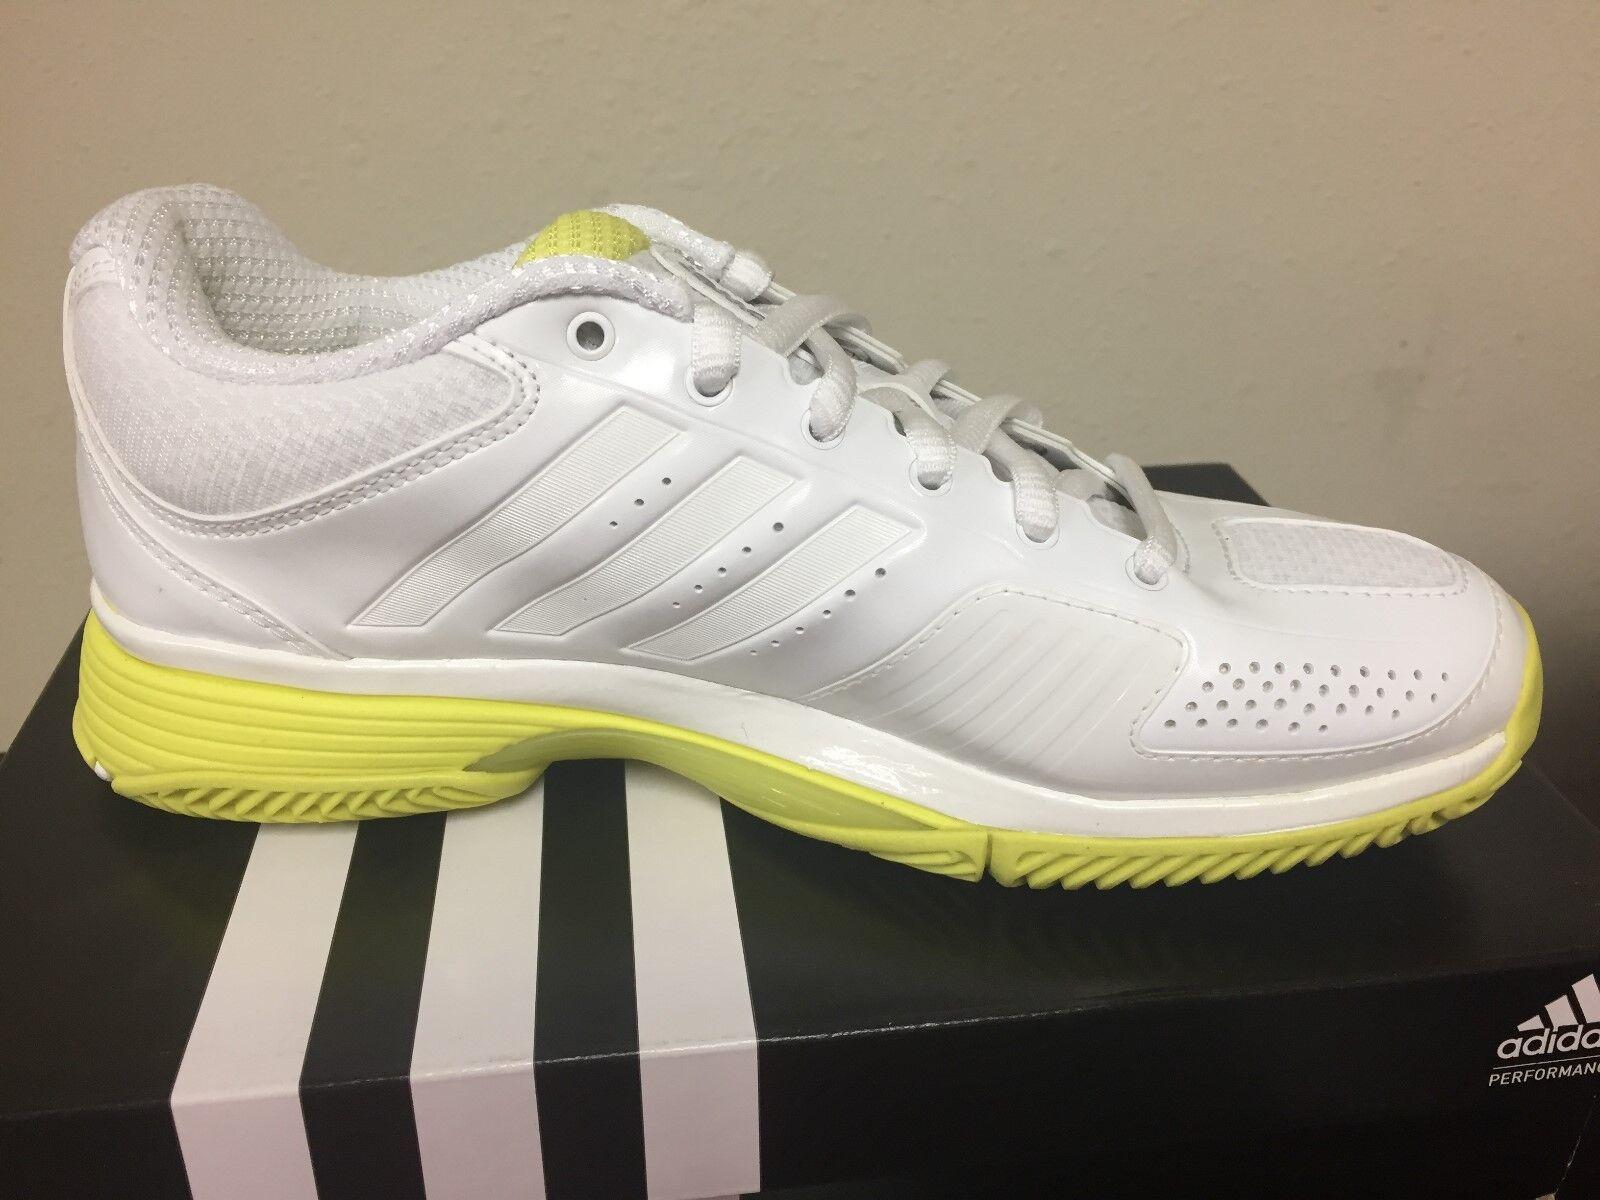 Adidas Womens Adipower Shoe Barricade Tennis Shoe Adipower Style #G64775 20c869